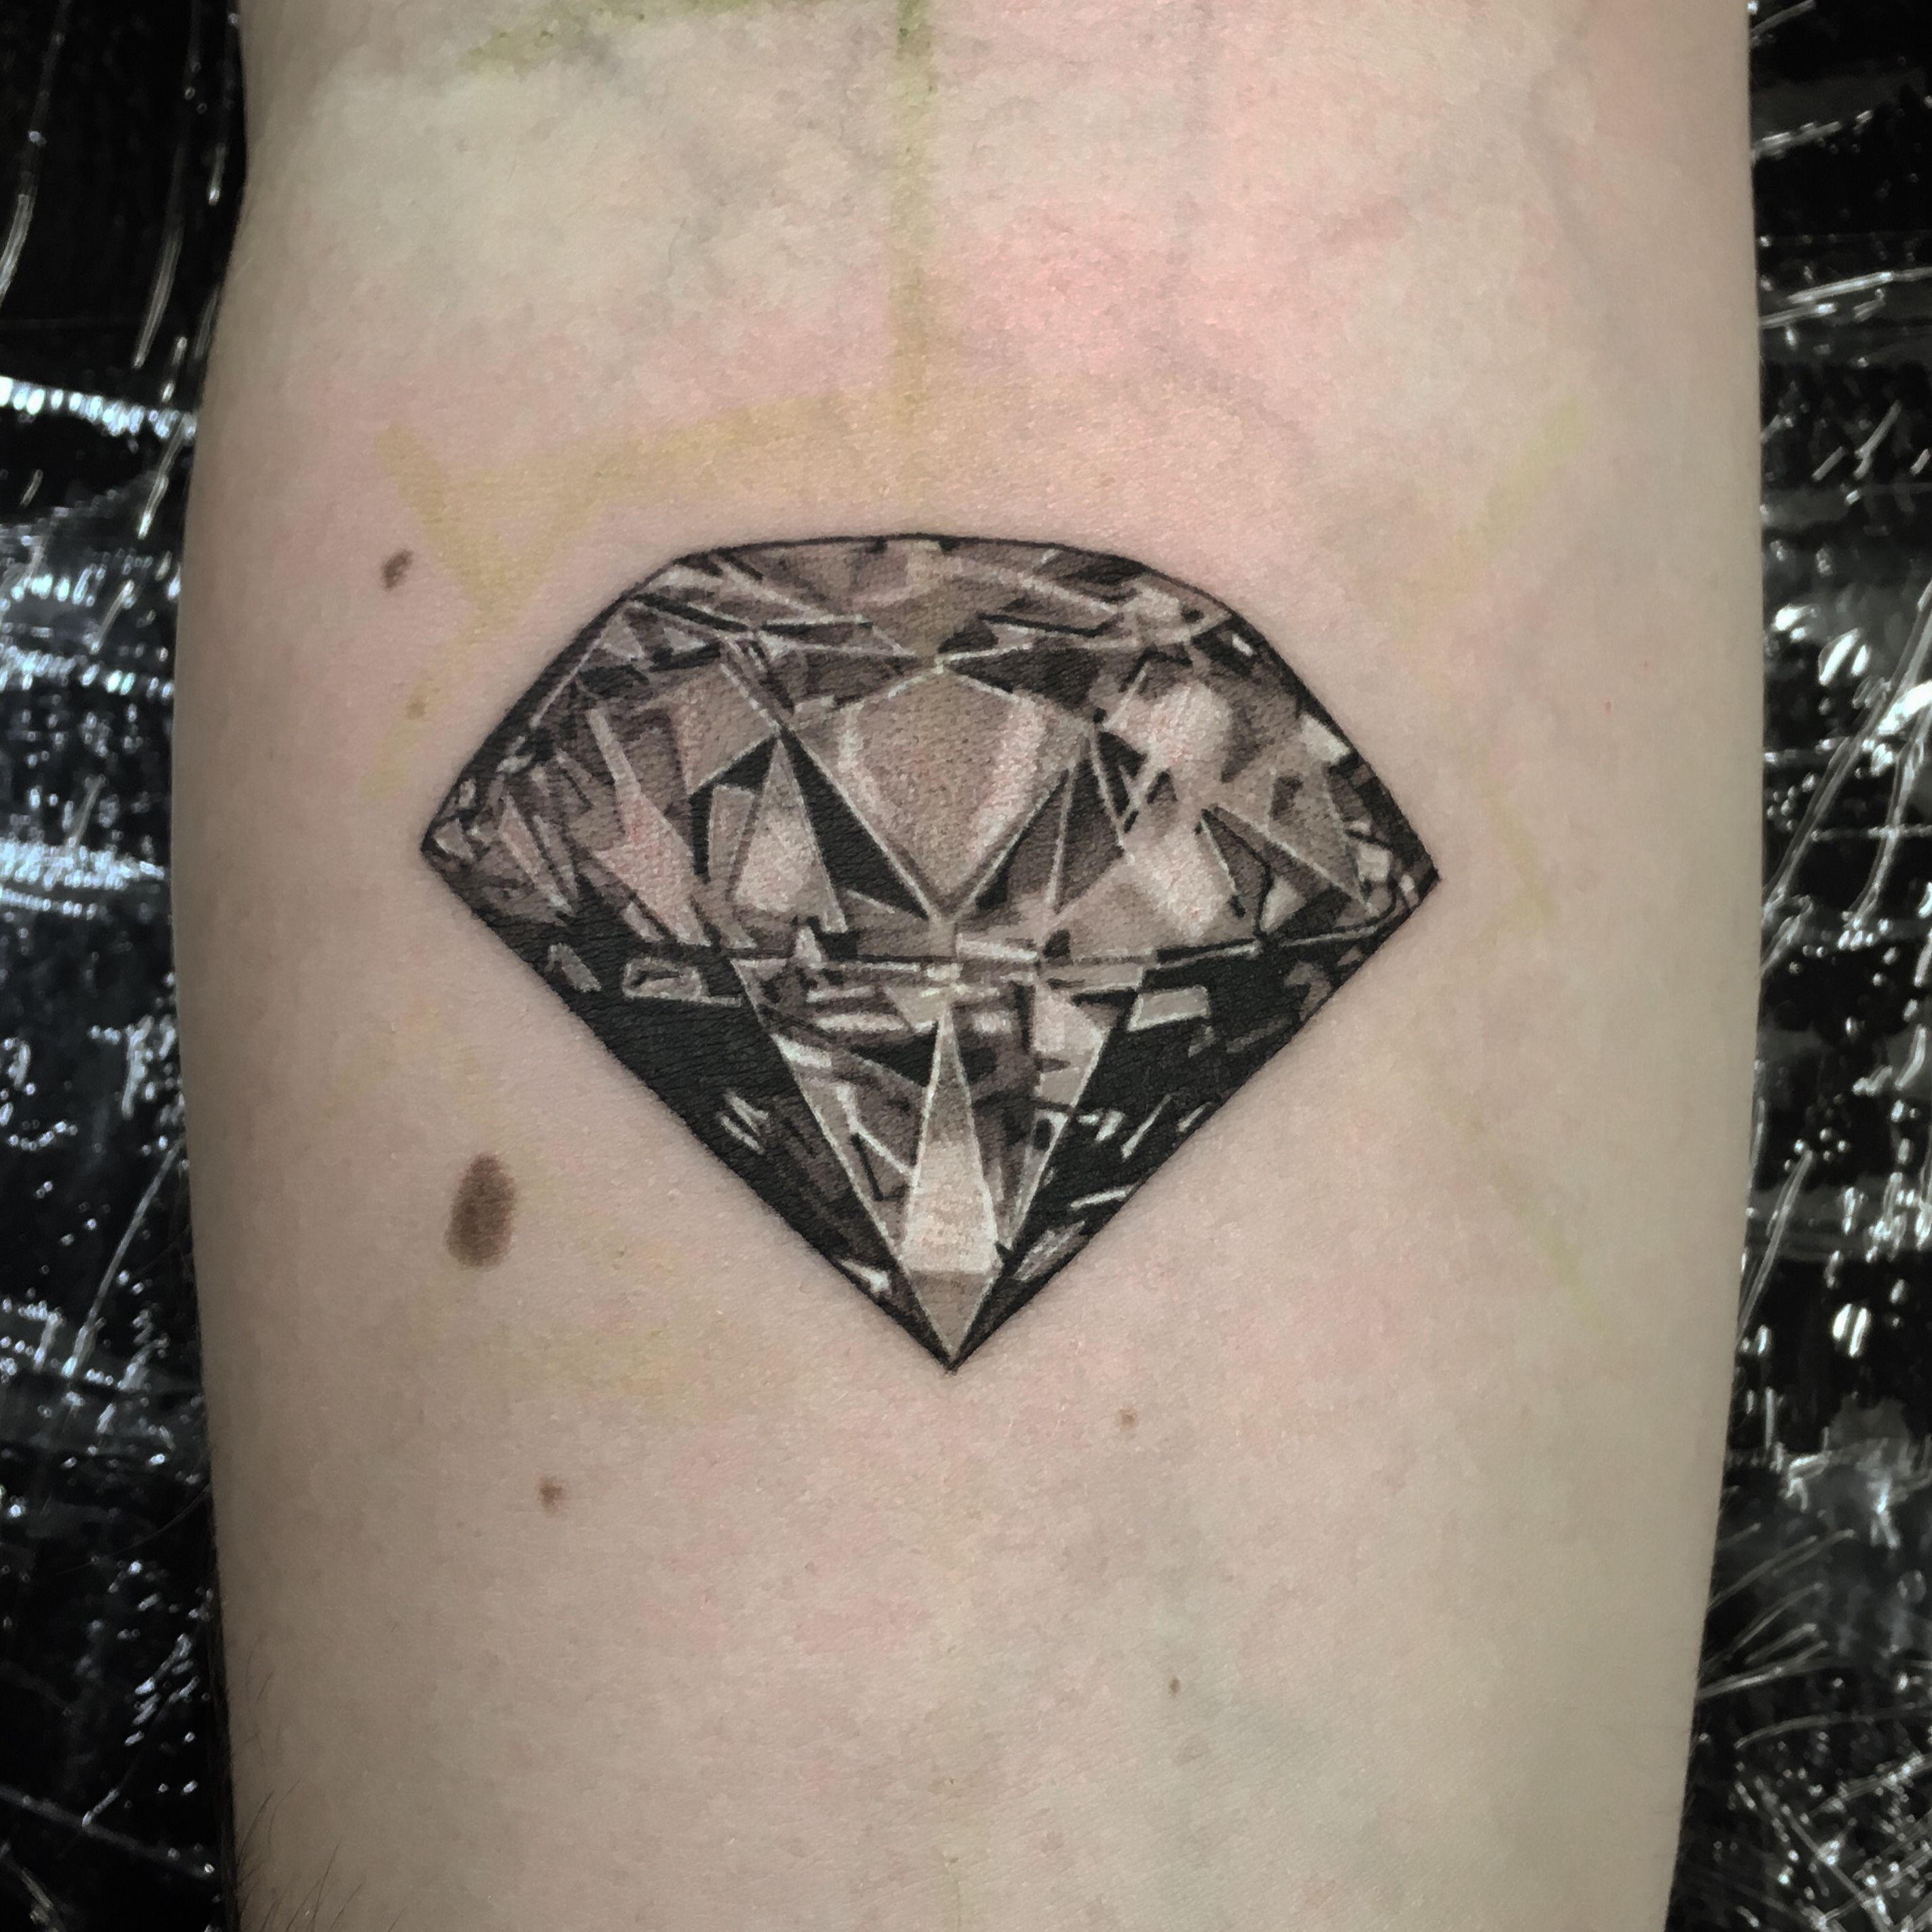 Black Grey Diamond Berlintattoo Diamond Blackandgrey Blackandwhite Inked Skinart By Lil Jeon Done A Black Diamond Tattoos Gem Tattoo Diamond Tattoos